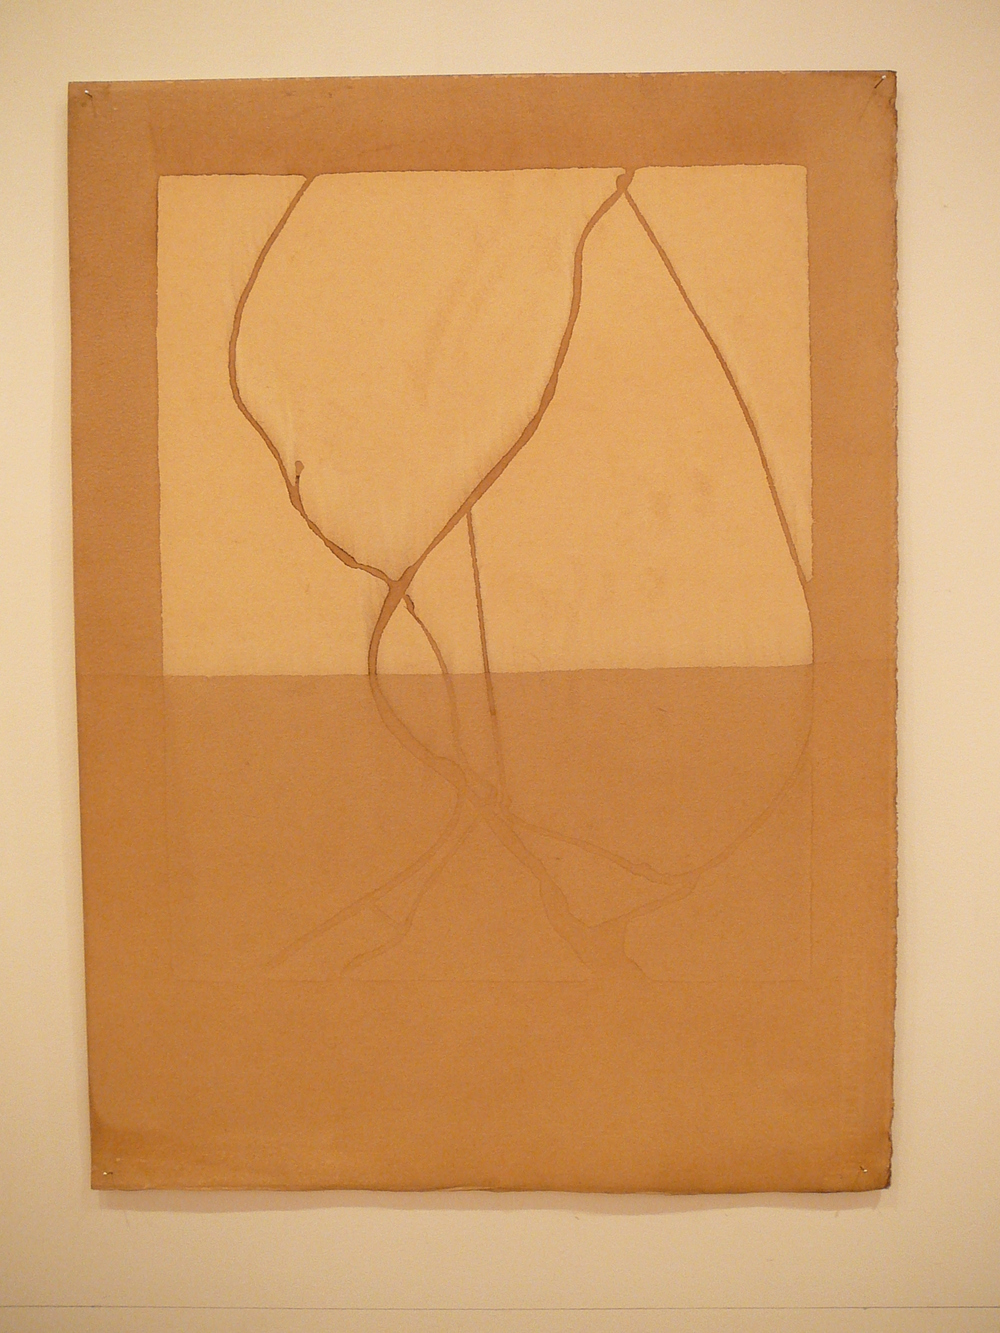 Cholango expo 2014 030 (9).JPG